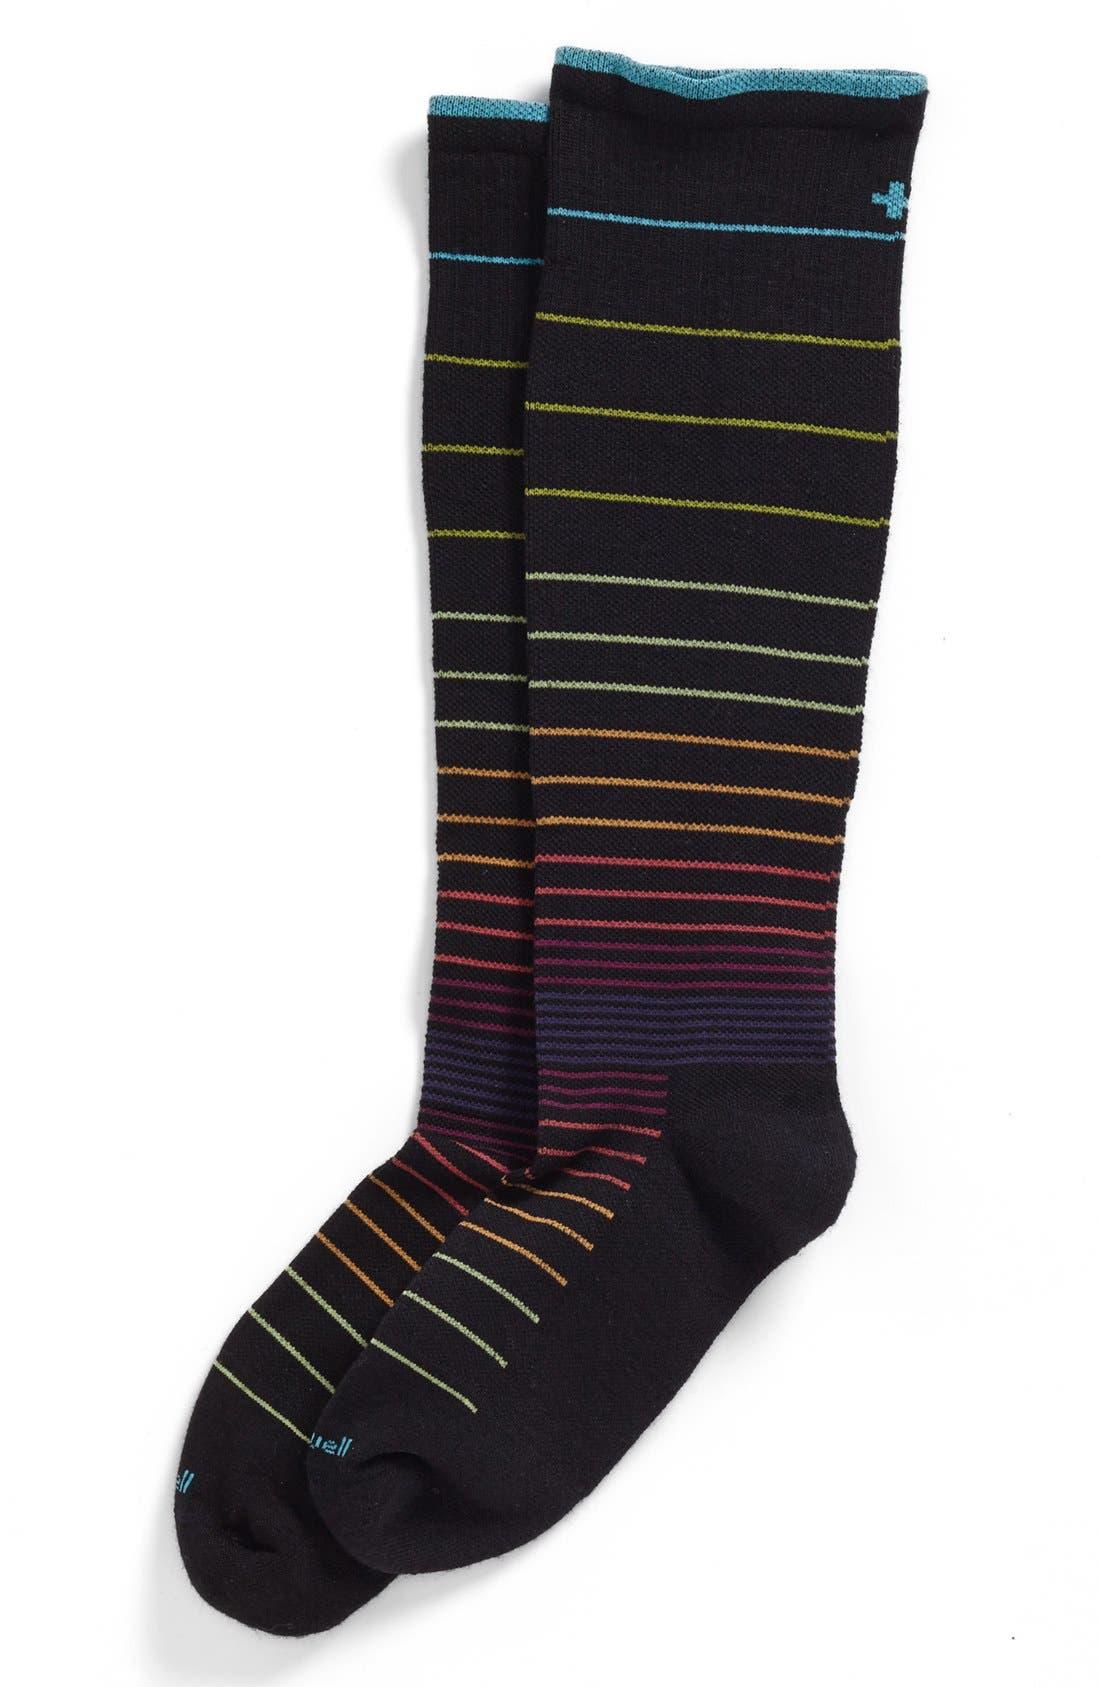 Circulator Compression Socks,                             Main thumbnail 1, color,                             BLACK STRIPE